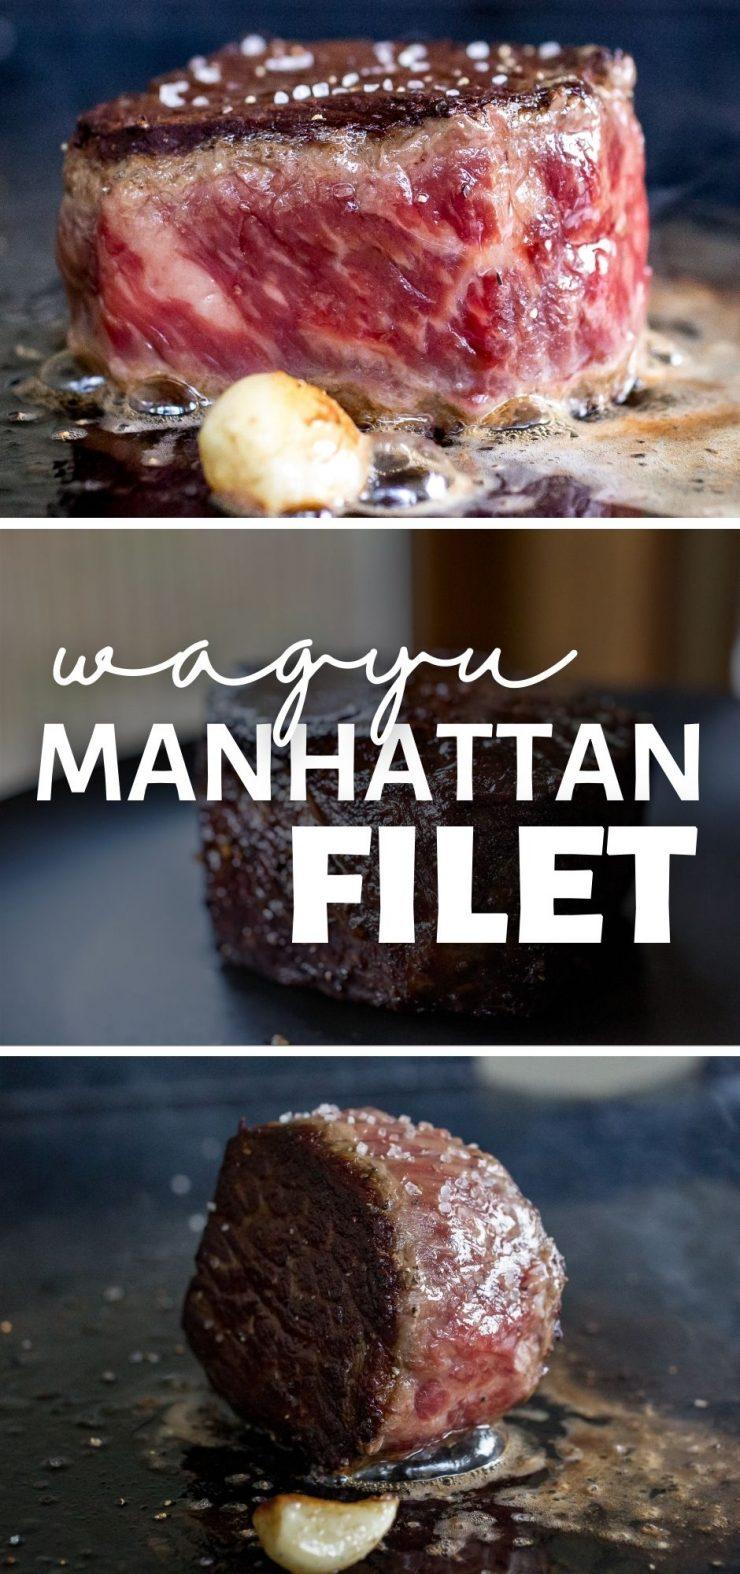 Snake River Farms Wagyu Manhattan Filet